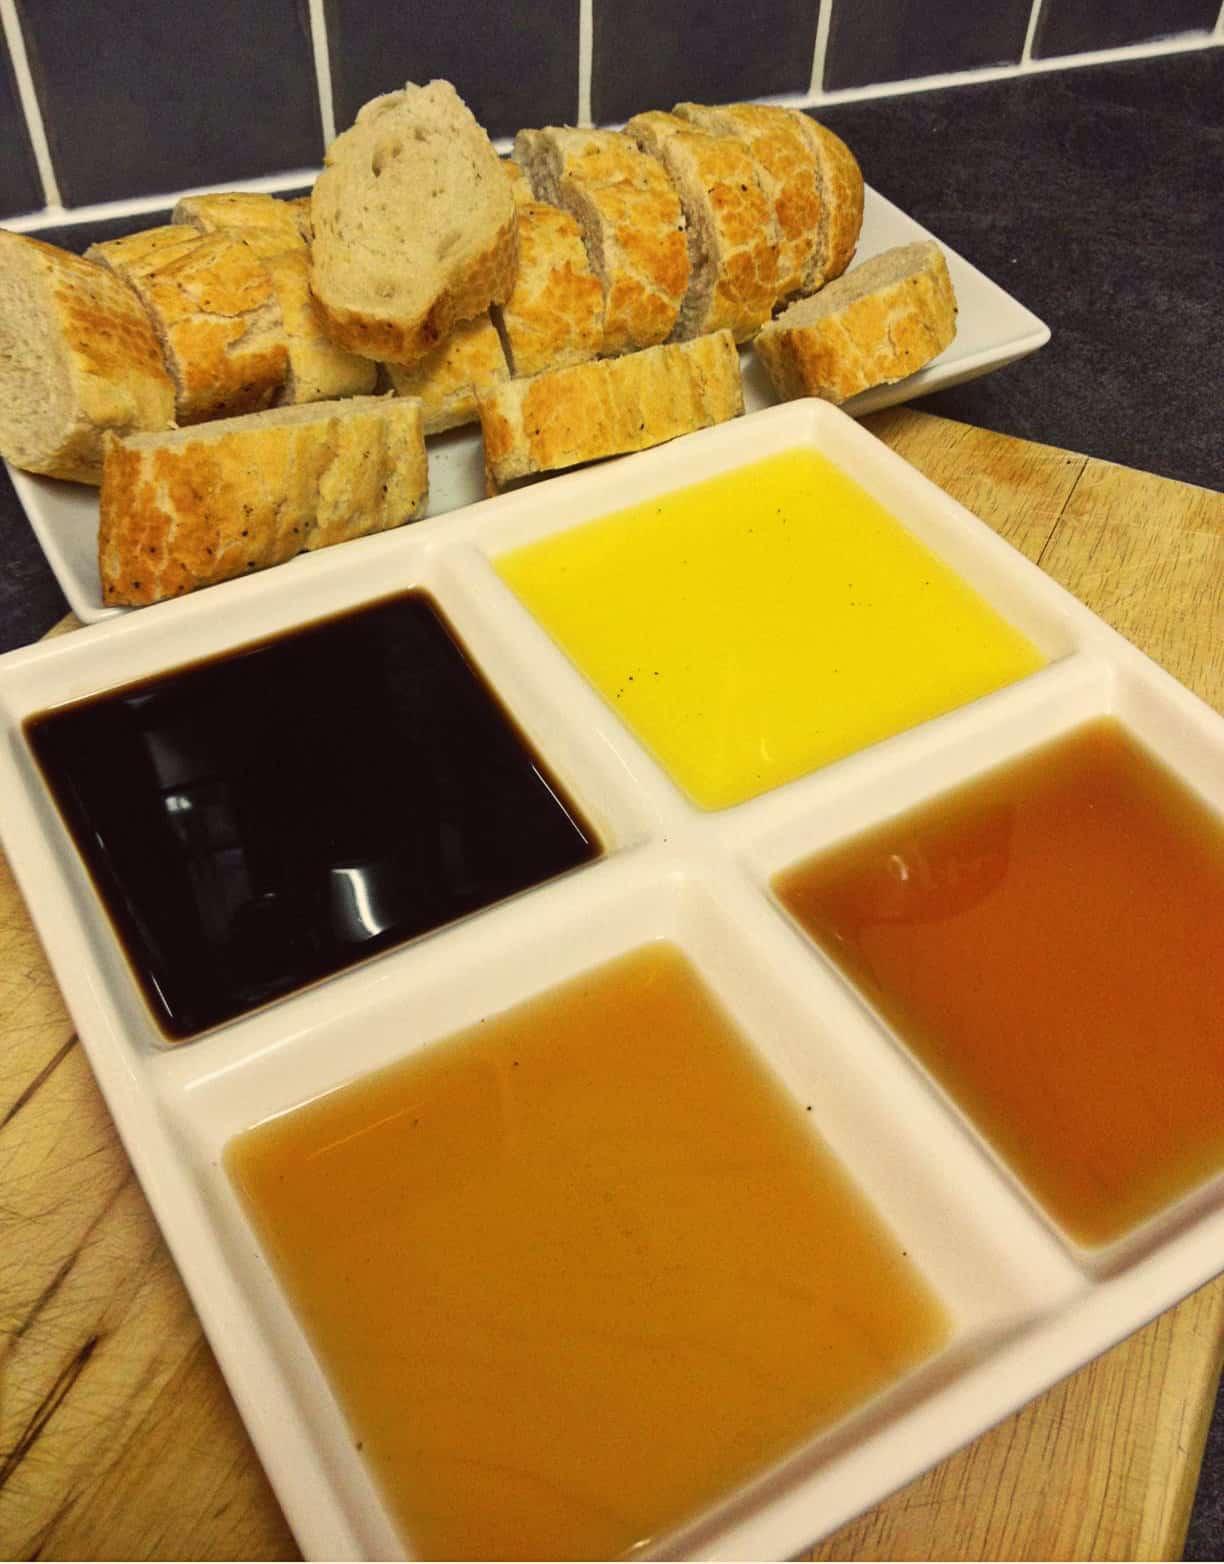 Alan Coxon oil vinegar french stick